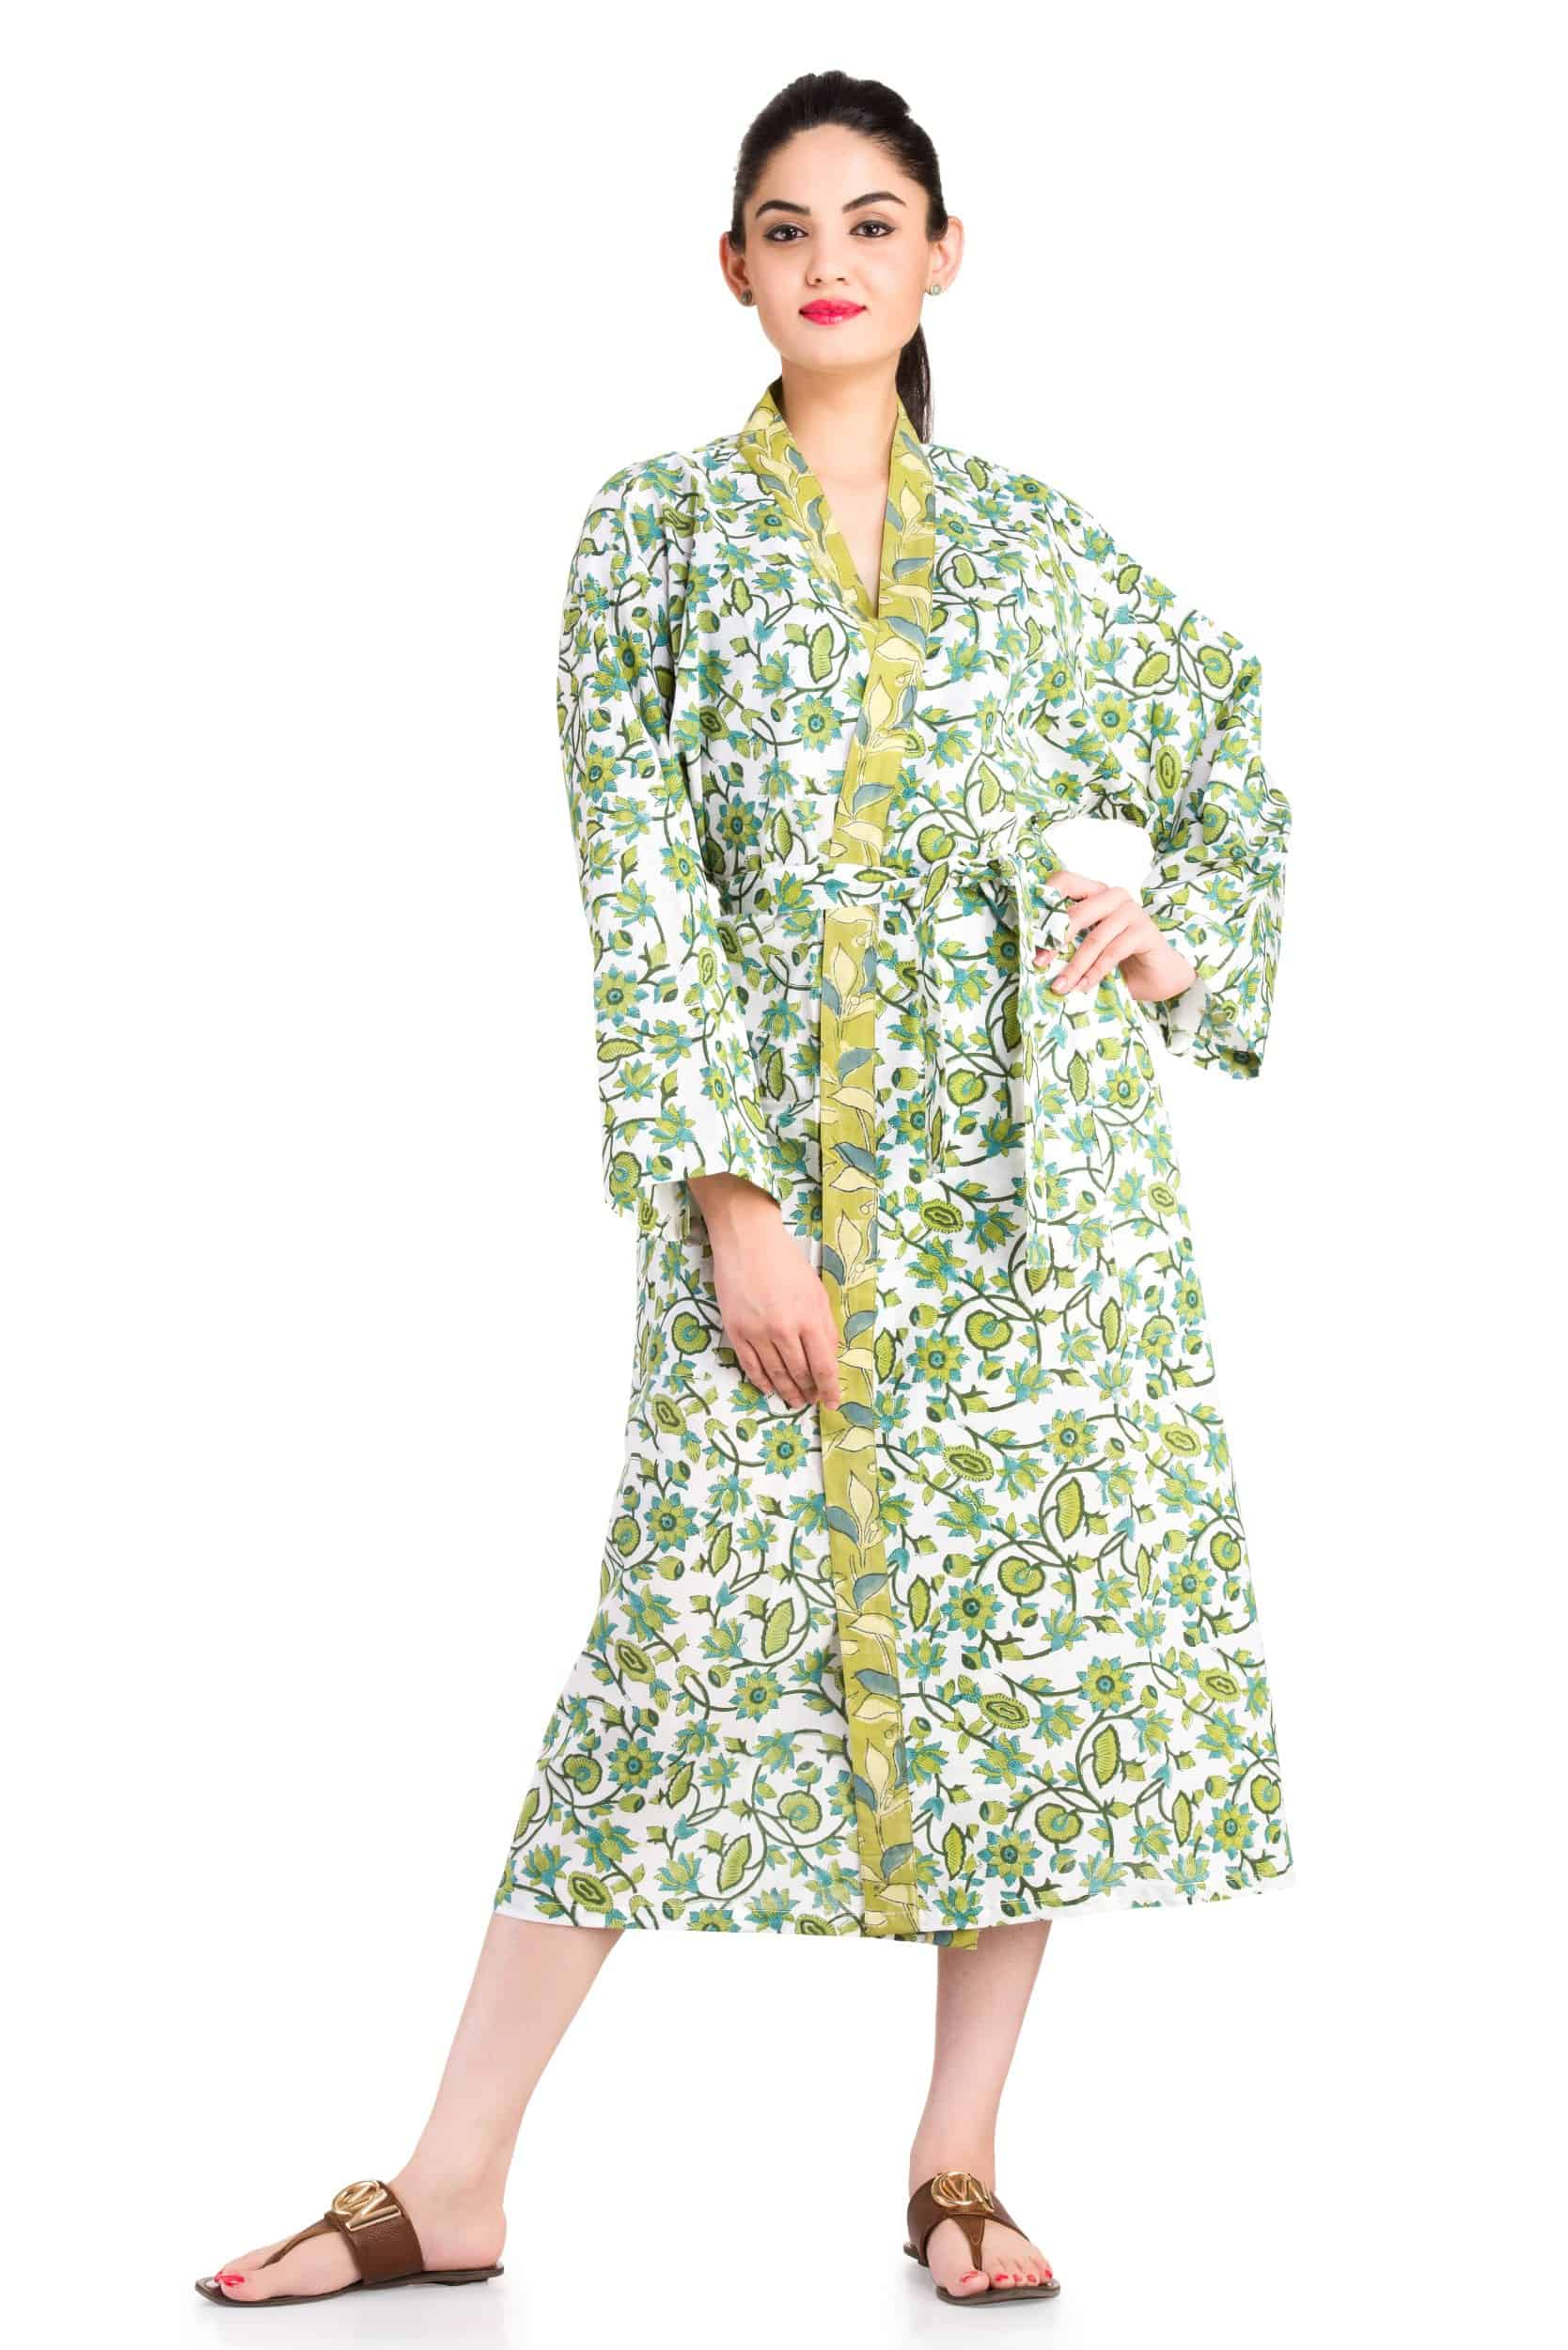 Kimono Block Printed Robes - Handicraft Palace bfc158df8